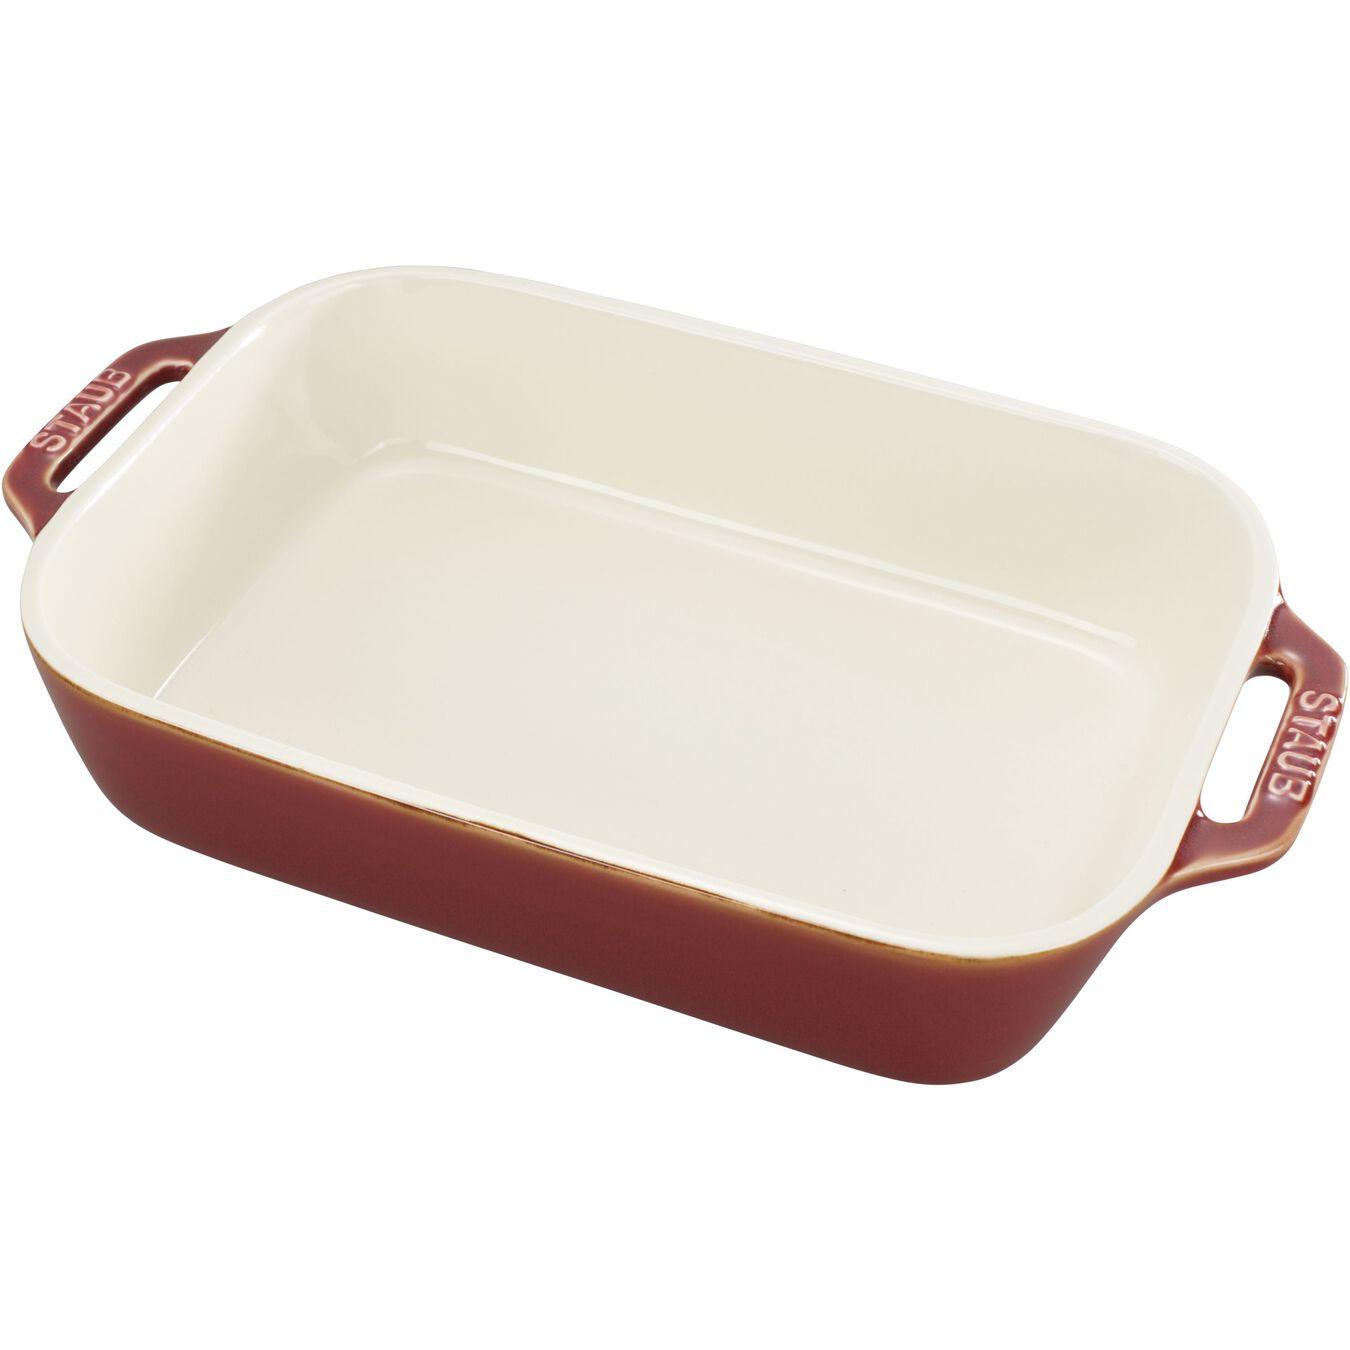 10.5-inch x 7.5-inch Rectangular Baking Dish - Rustic Red,,large 2